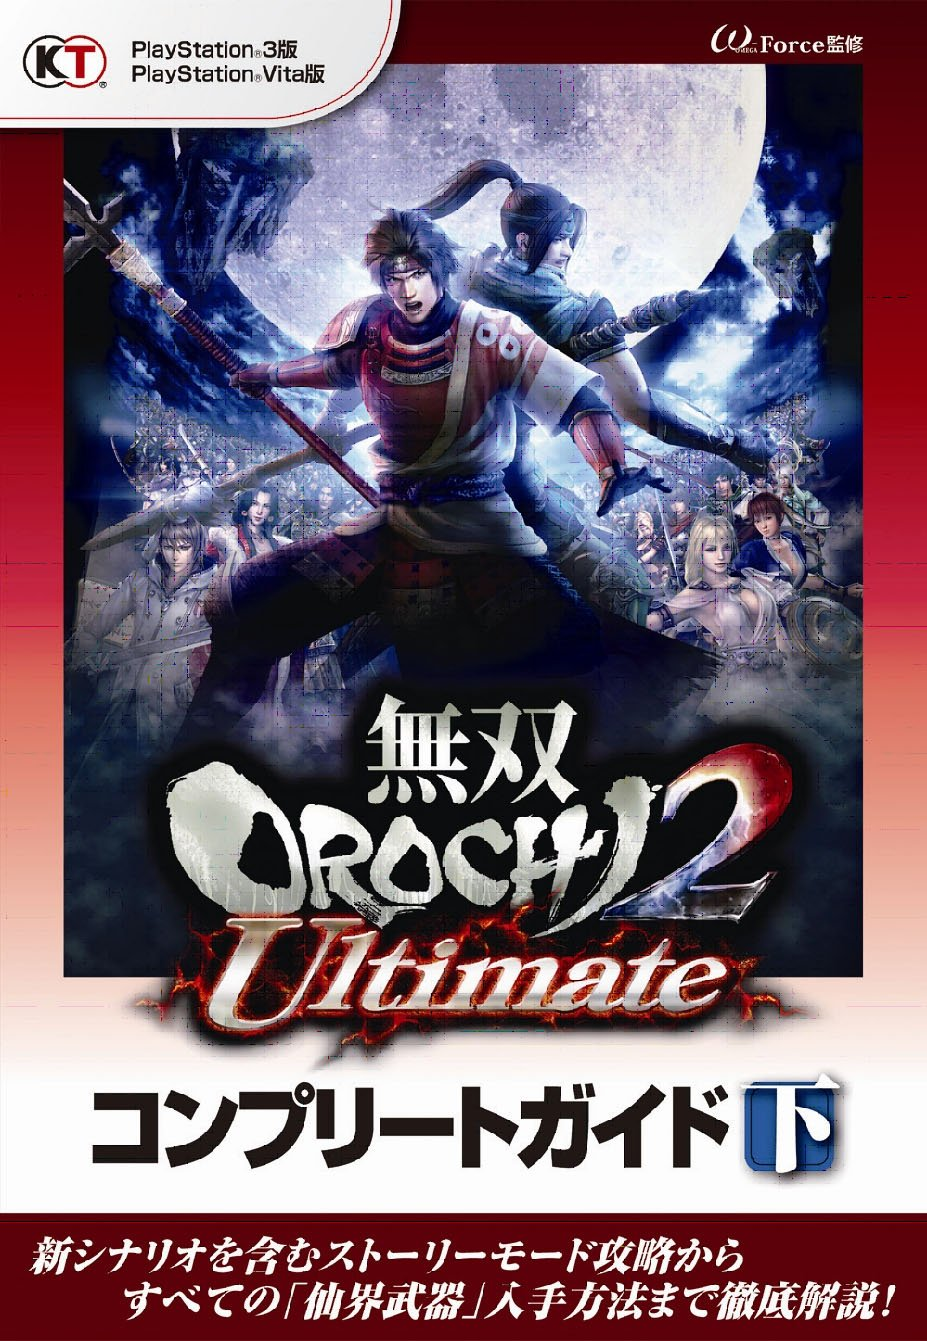 Orochi3 ultimate 最強 武器 無双